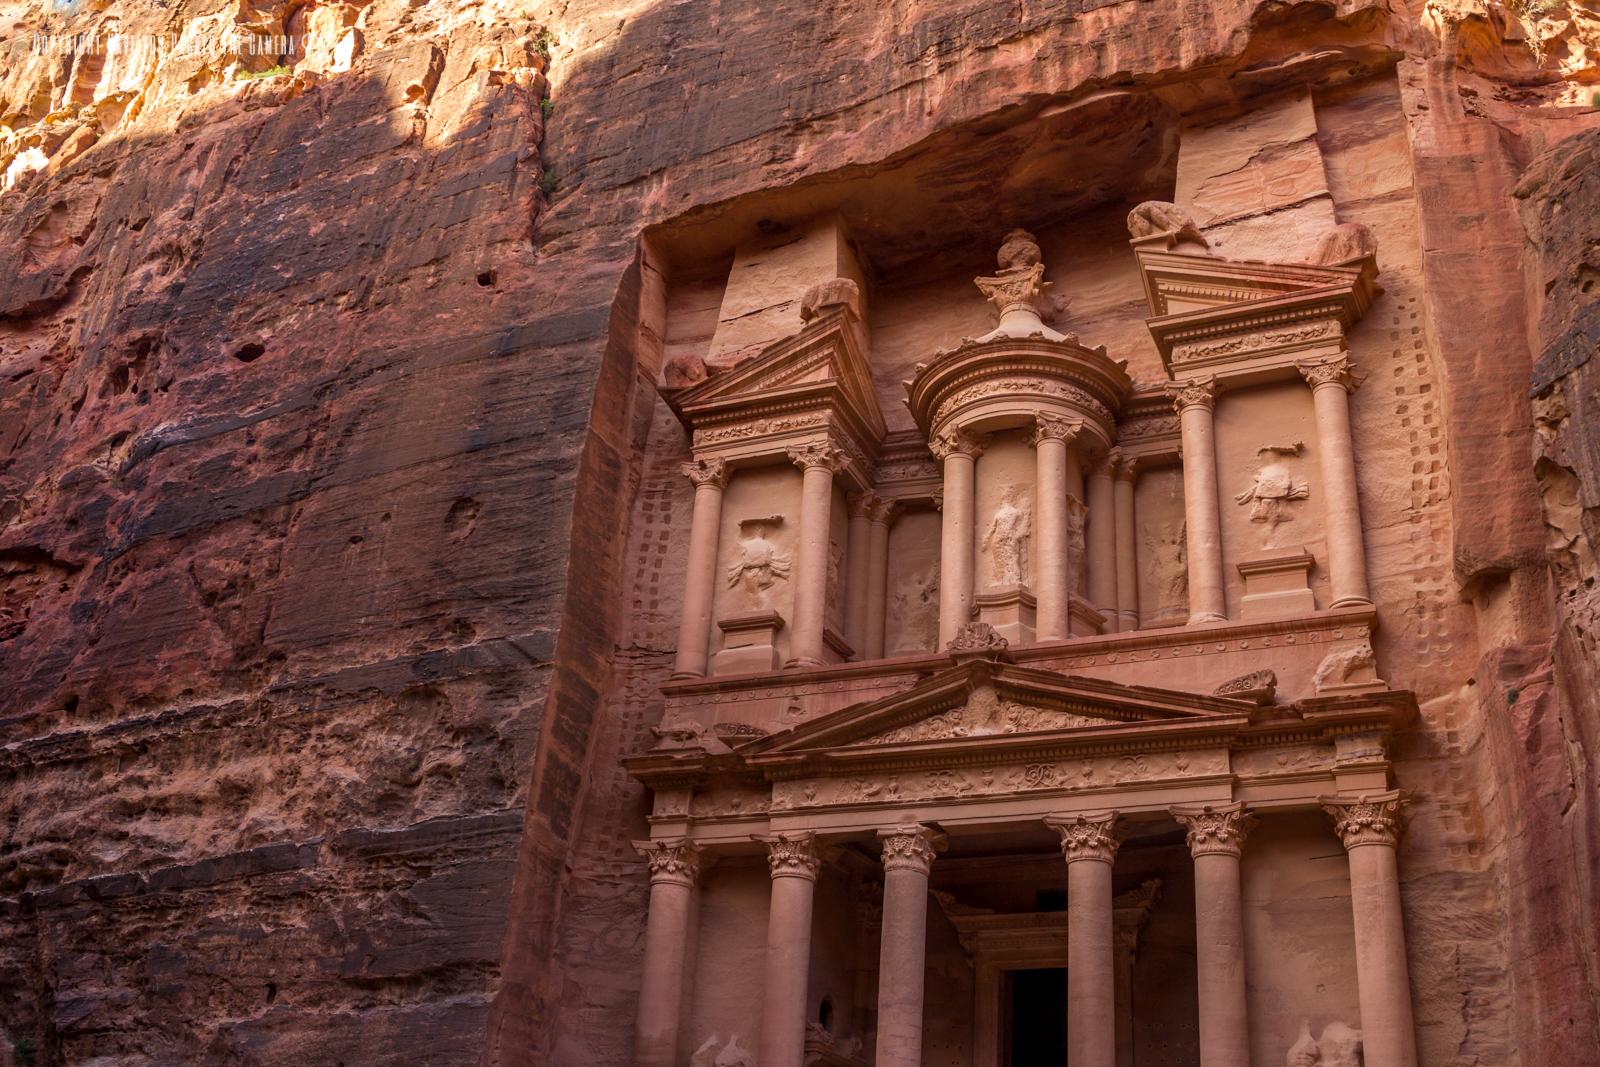 Abrumar Hundimiento Creyente  The ancient city of Petra, Jordan